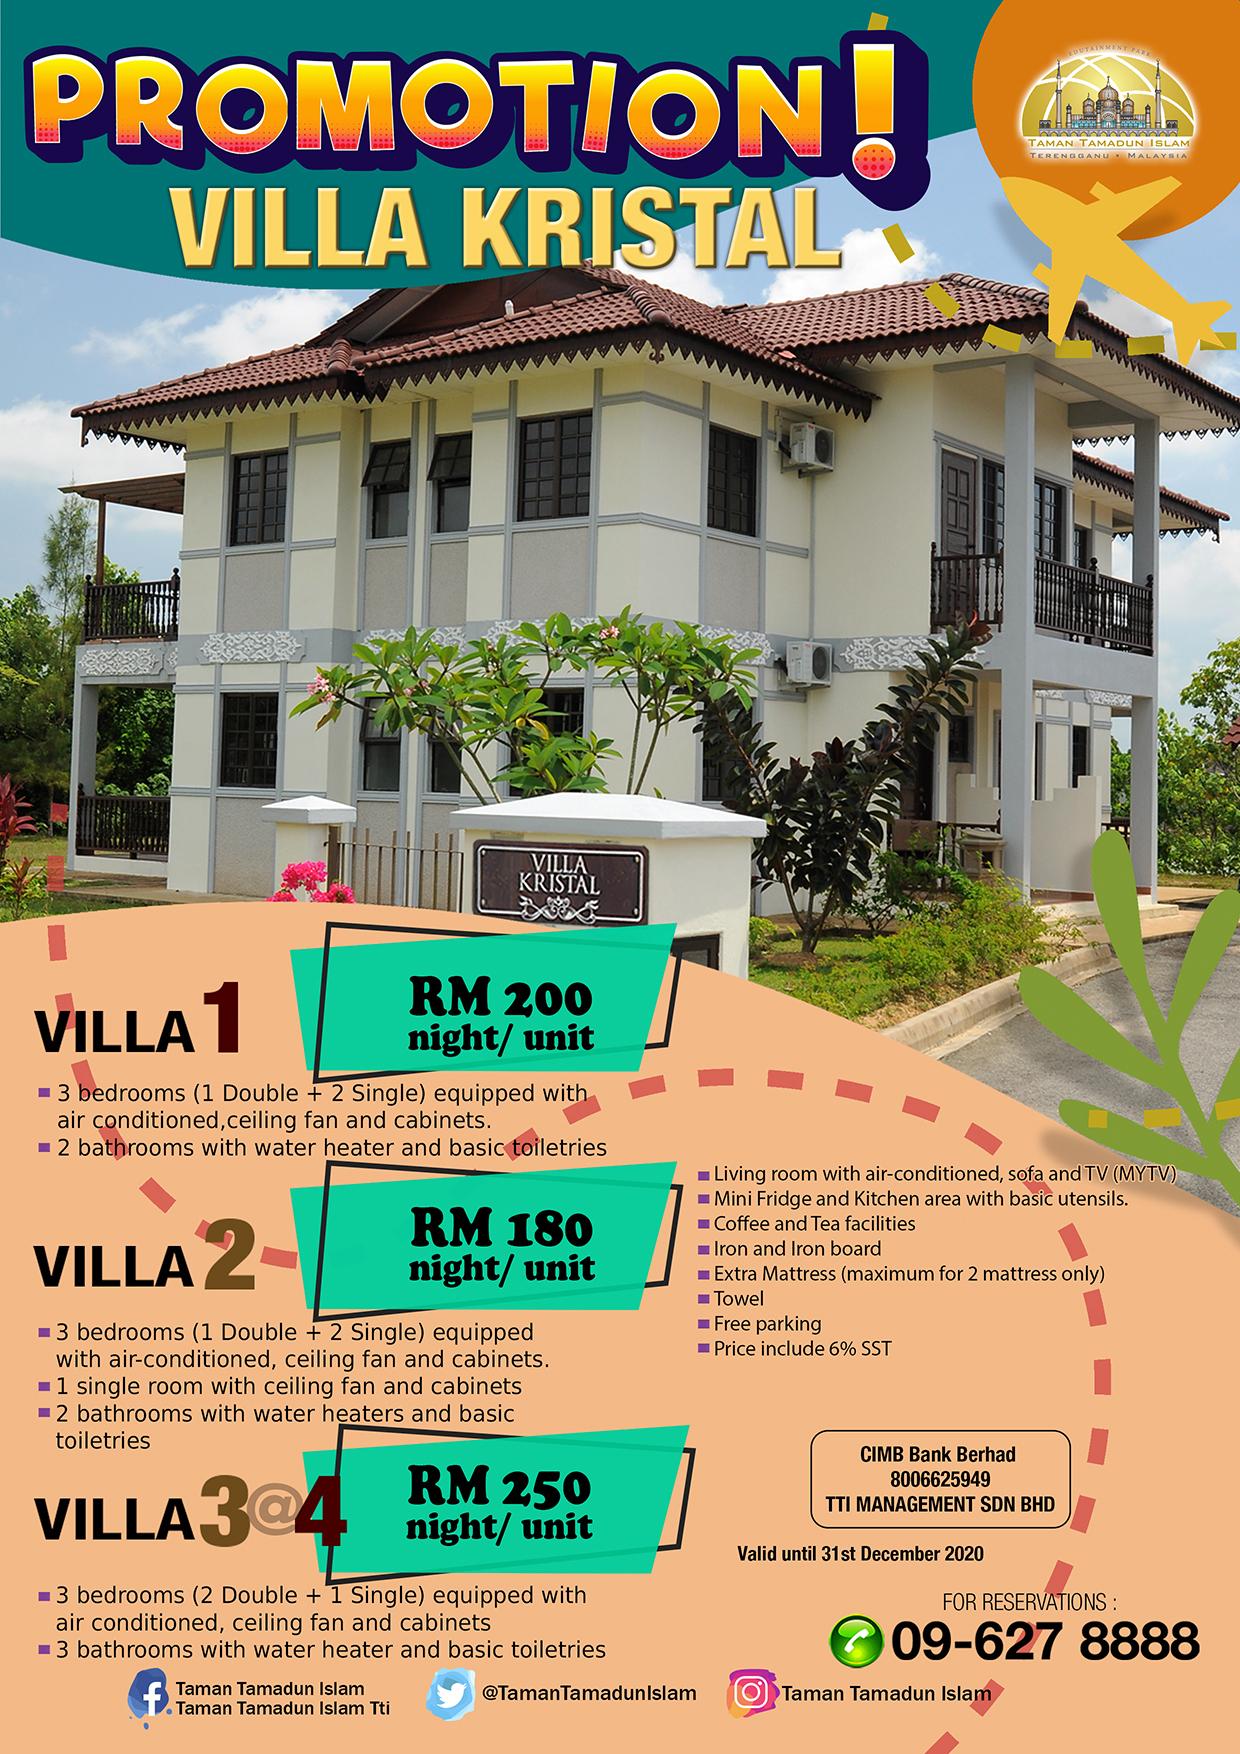 Promosi Villa Kristal